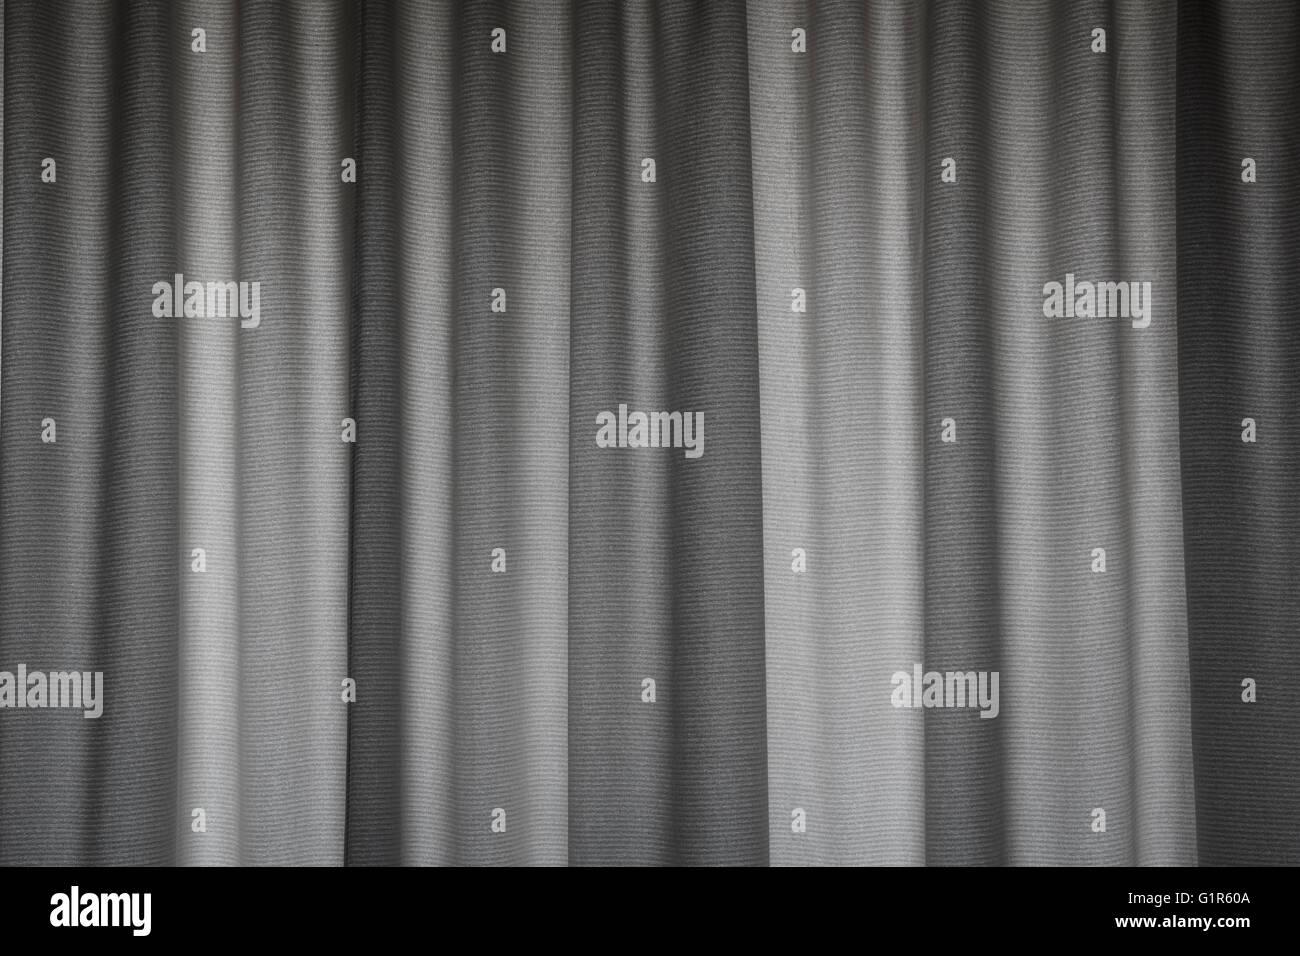 Linen Curtain - Stock Image